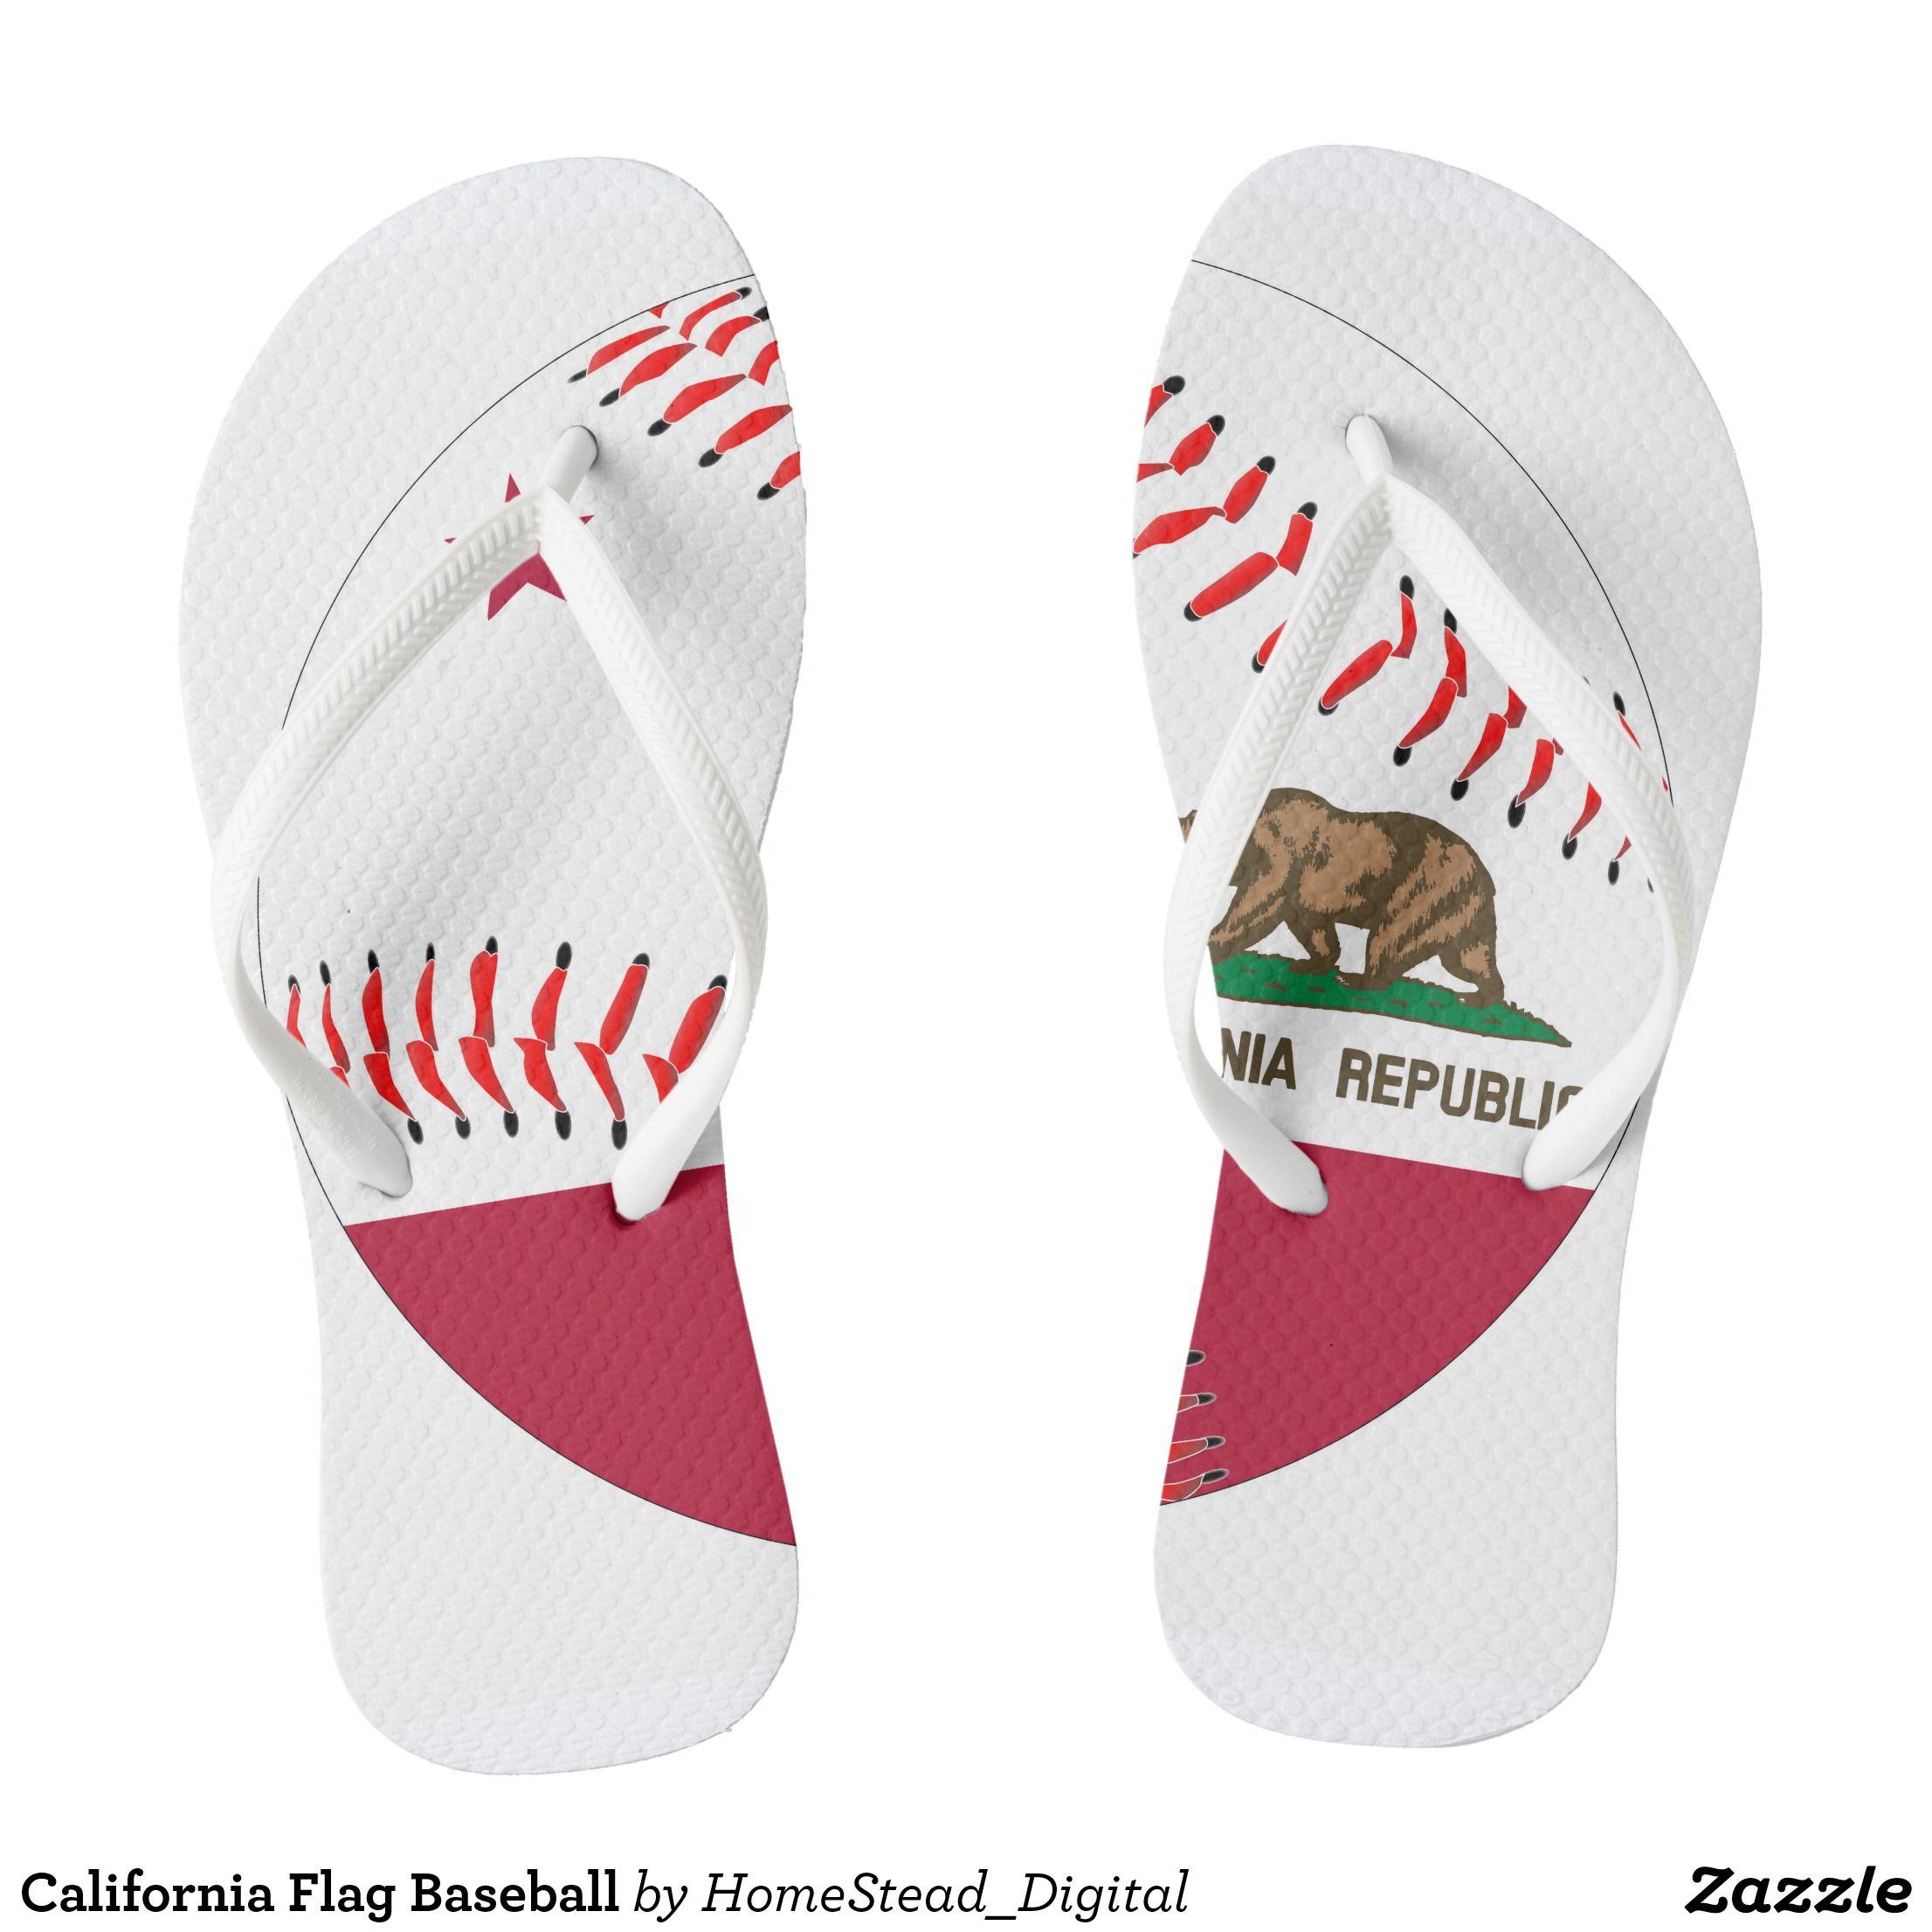 1a10e3853d87a California Flag Baseball Flip Flops - Durable Thong Style Hawaiian Beach  Sandals By Talented Fashion   Graphic Designers -  sandals  flipflops   hawaii ...